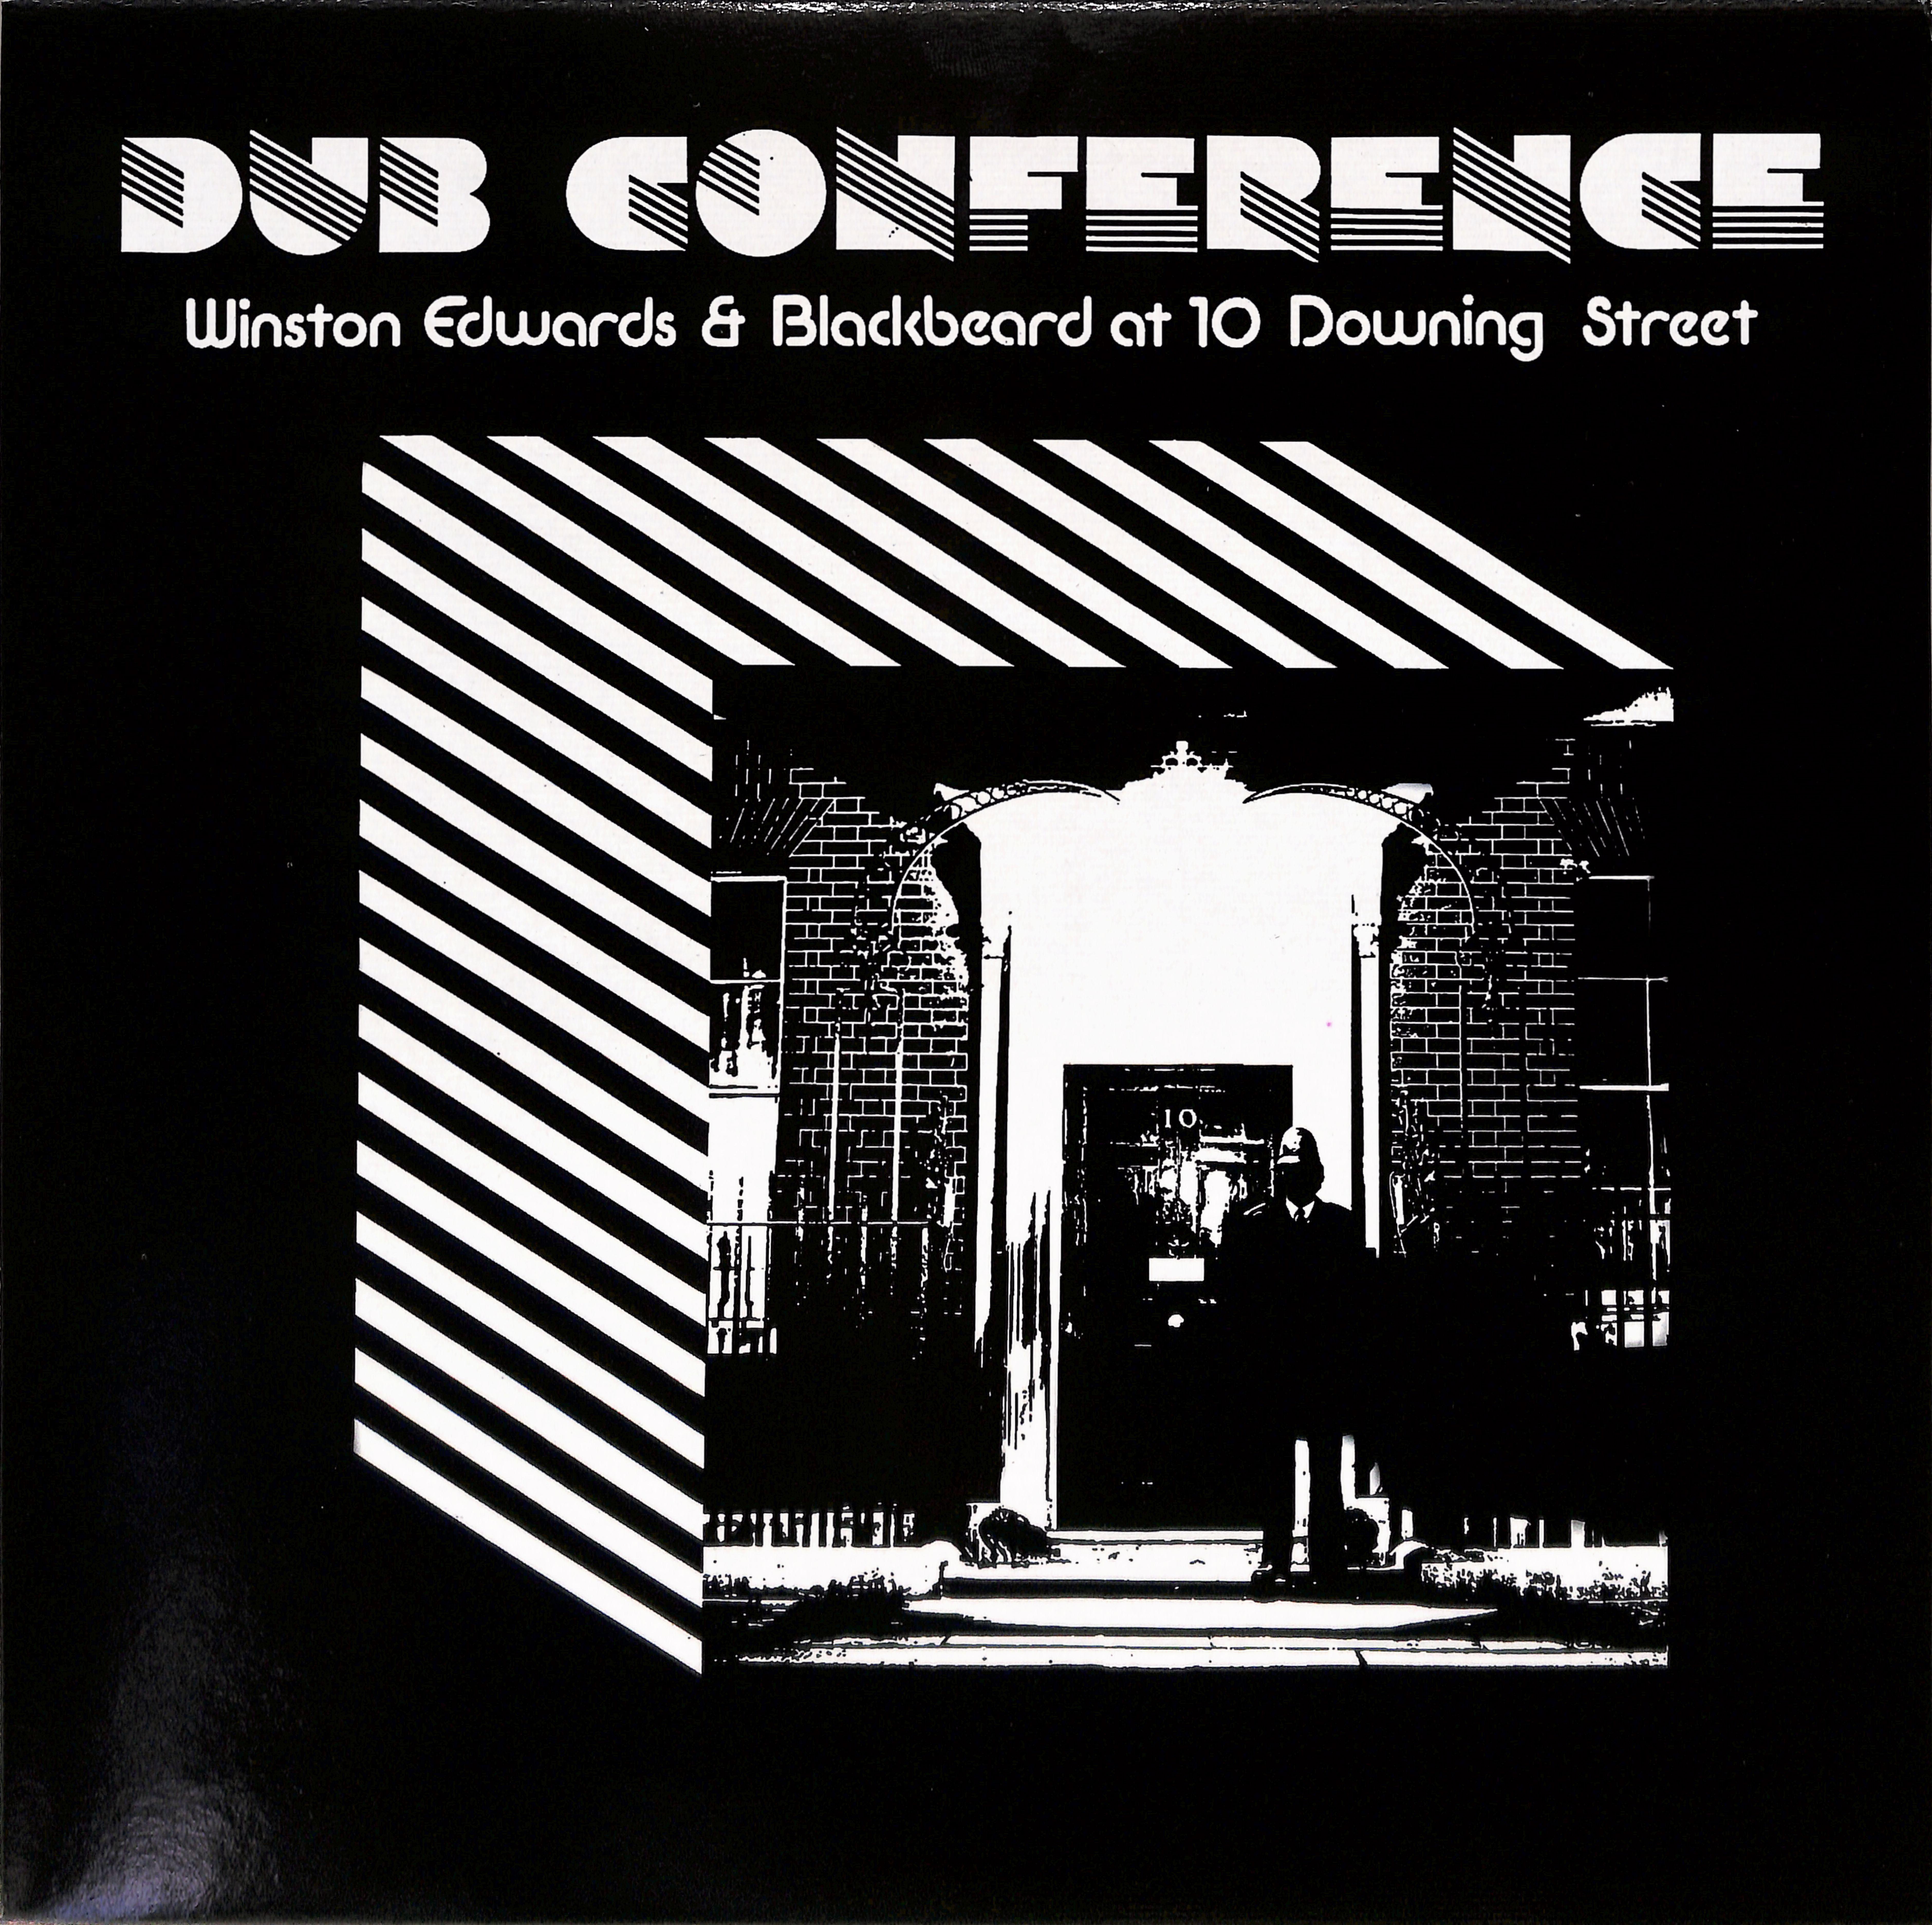 Winston Edwards & Blackbeard - DUB CONFERENCE AT 10 DOWNING STREET